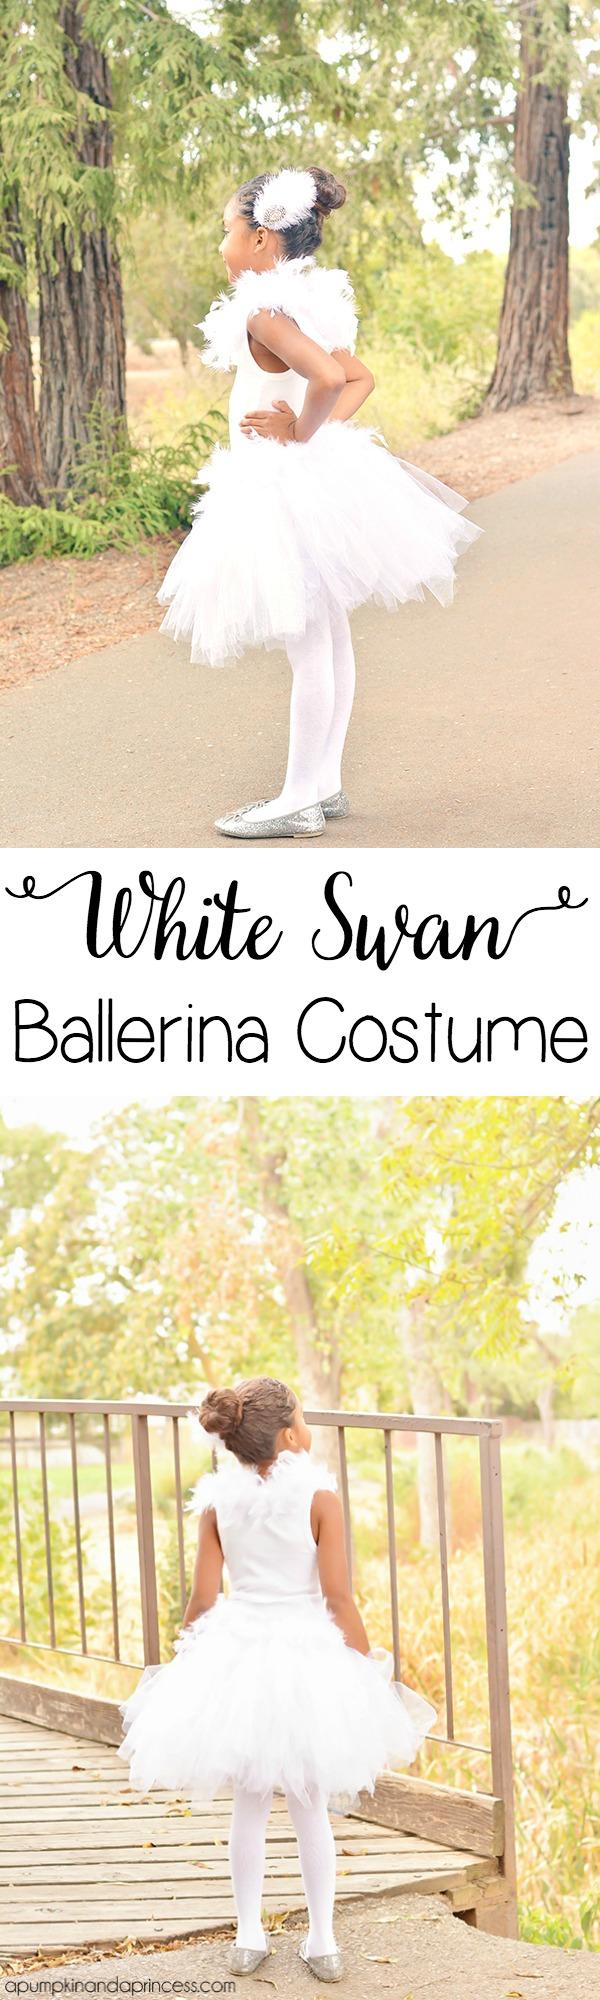 DIY-White-Swan-Ballerina-Costume